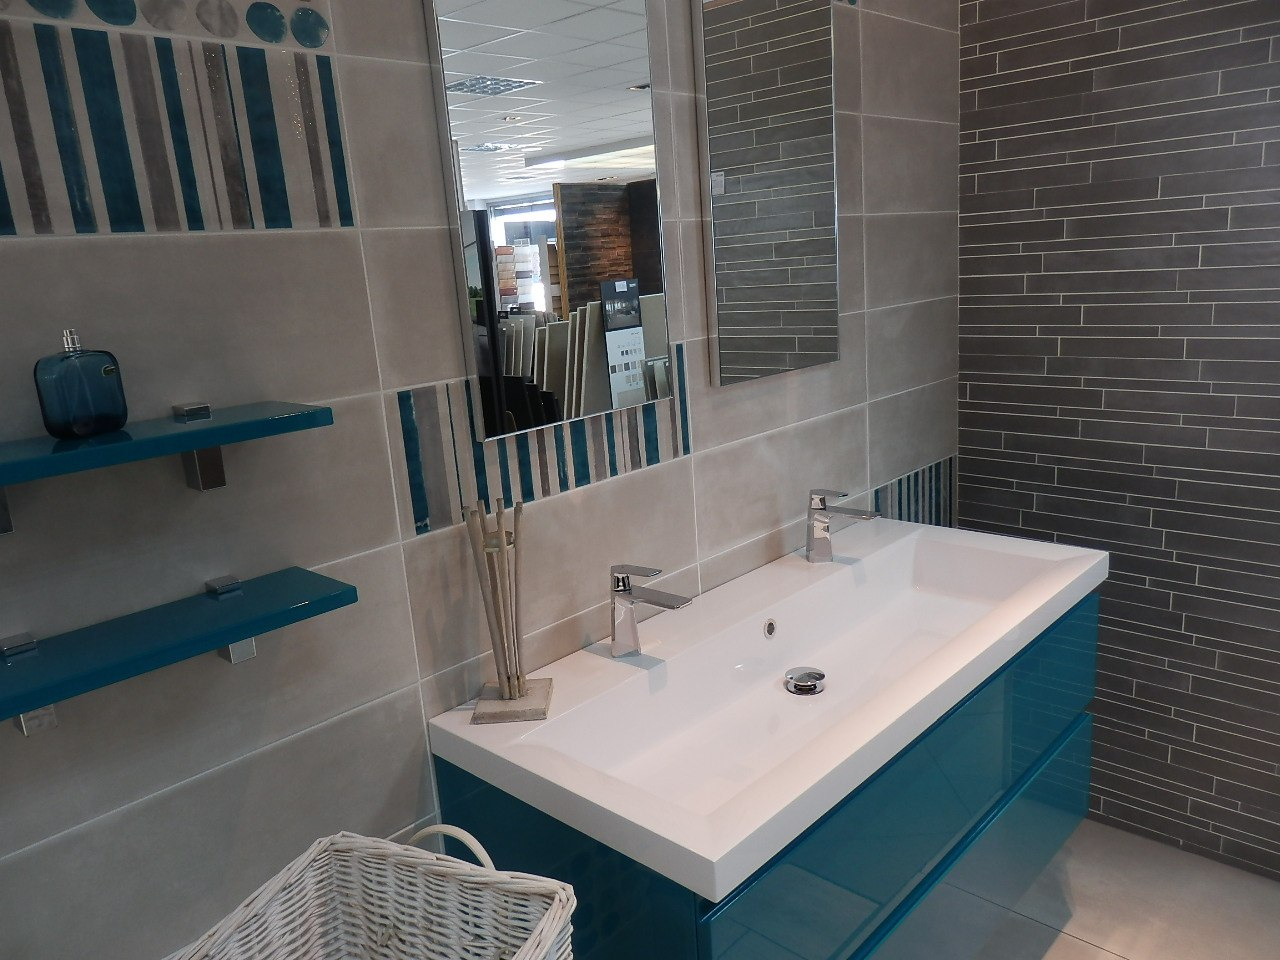 Salle De Bain Bleu Turquoise Salle De Bain Gris Turquoise Idees Conception Jardin Idees Conception Jardin